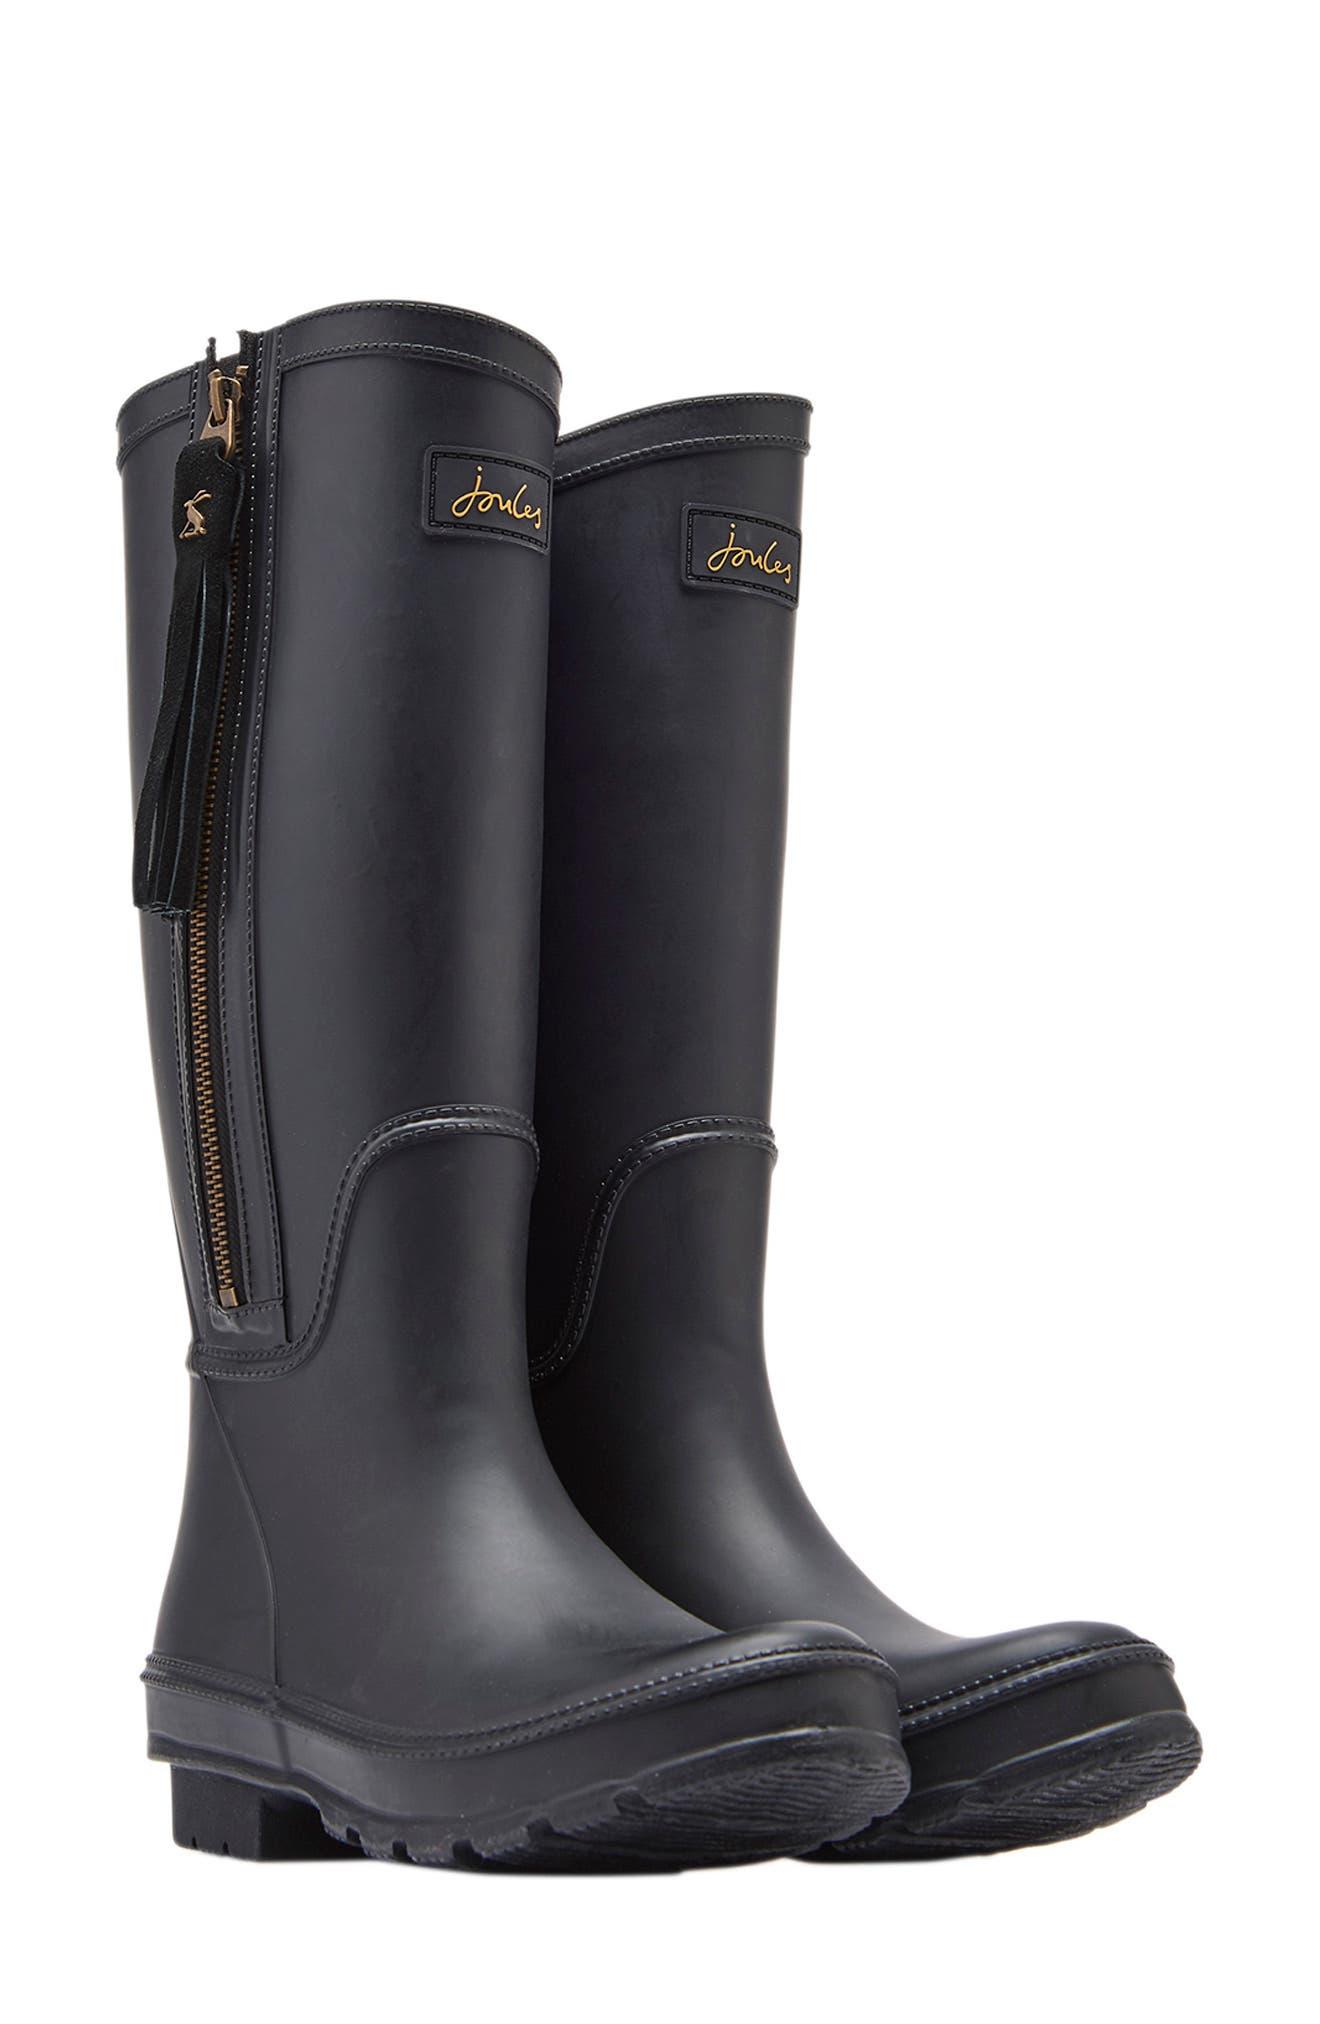 Collette Waterproof Rain Boot